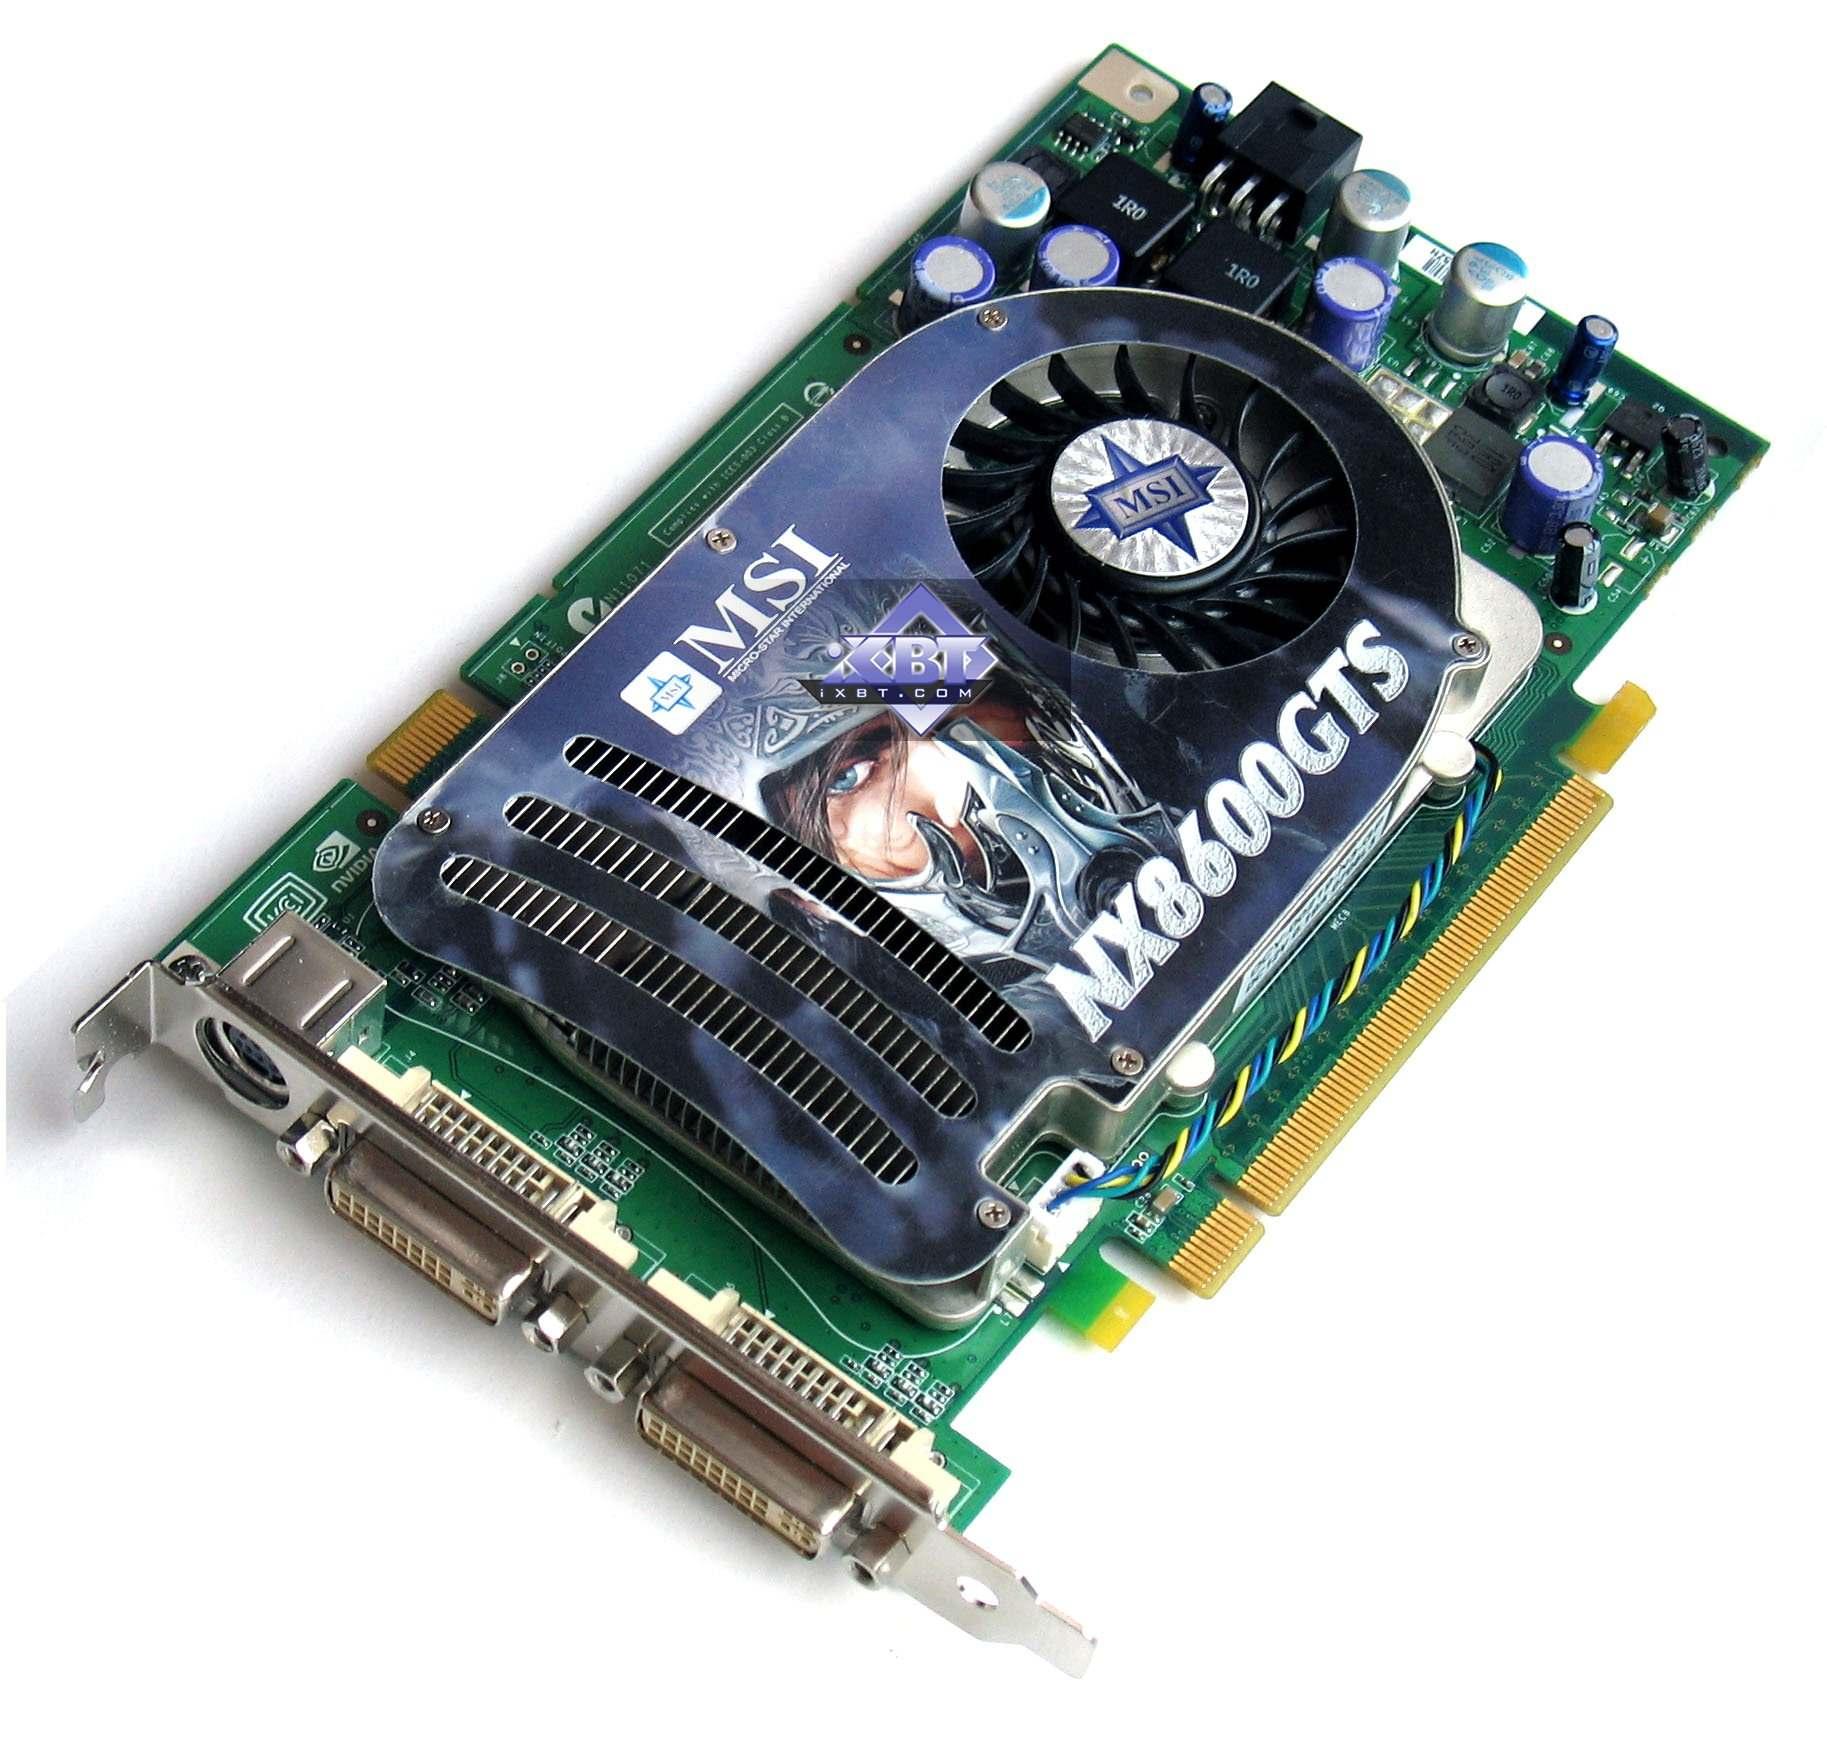 Драйвера Для Msi Geforse 8600Gt 256Mb